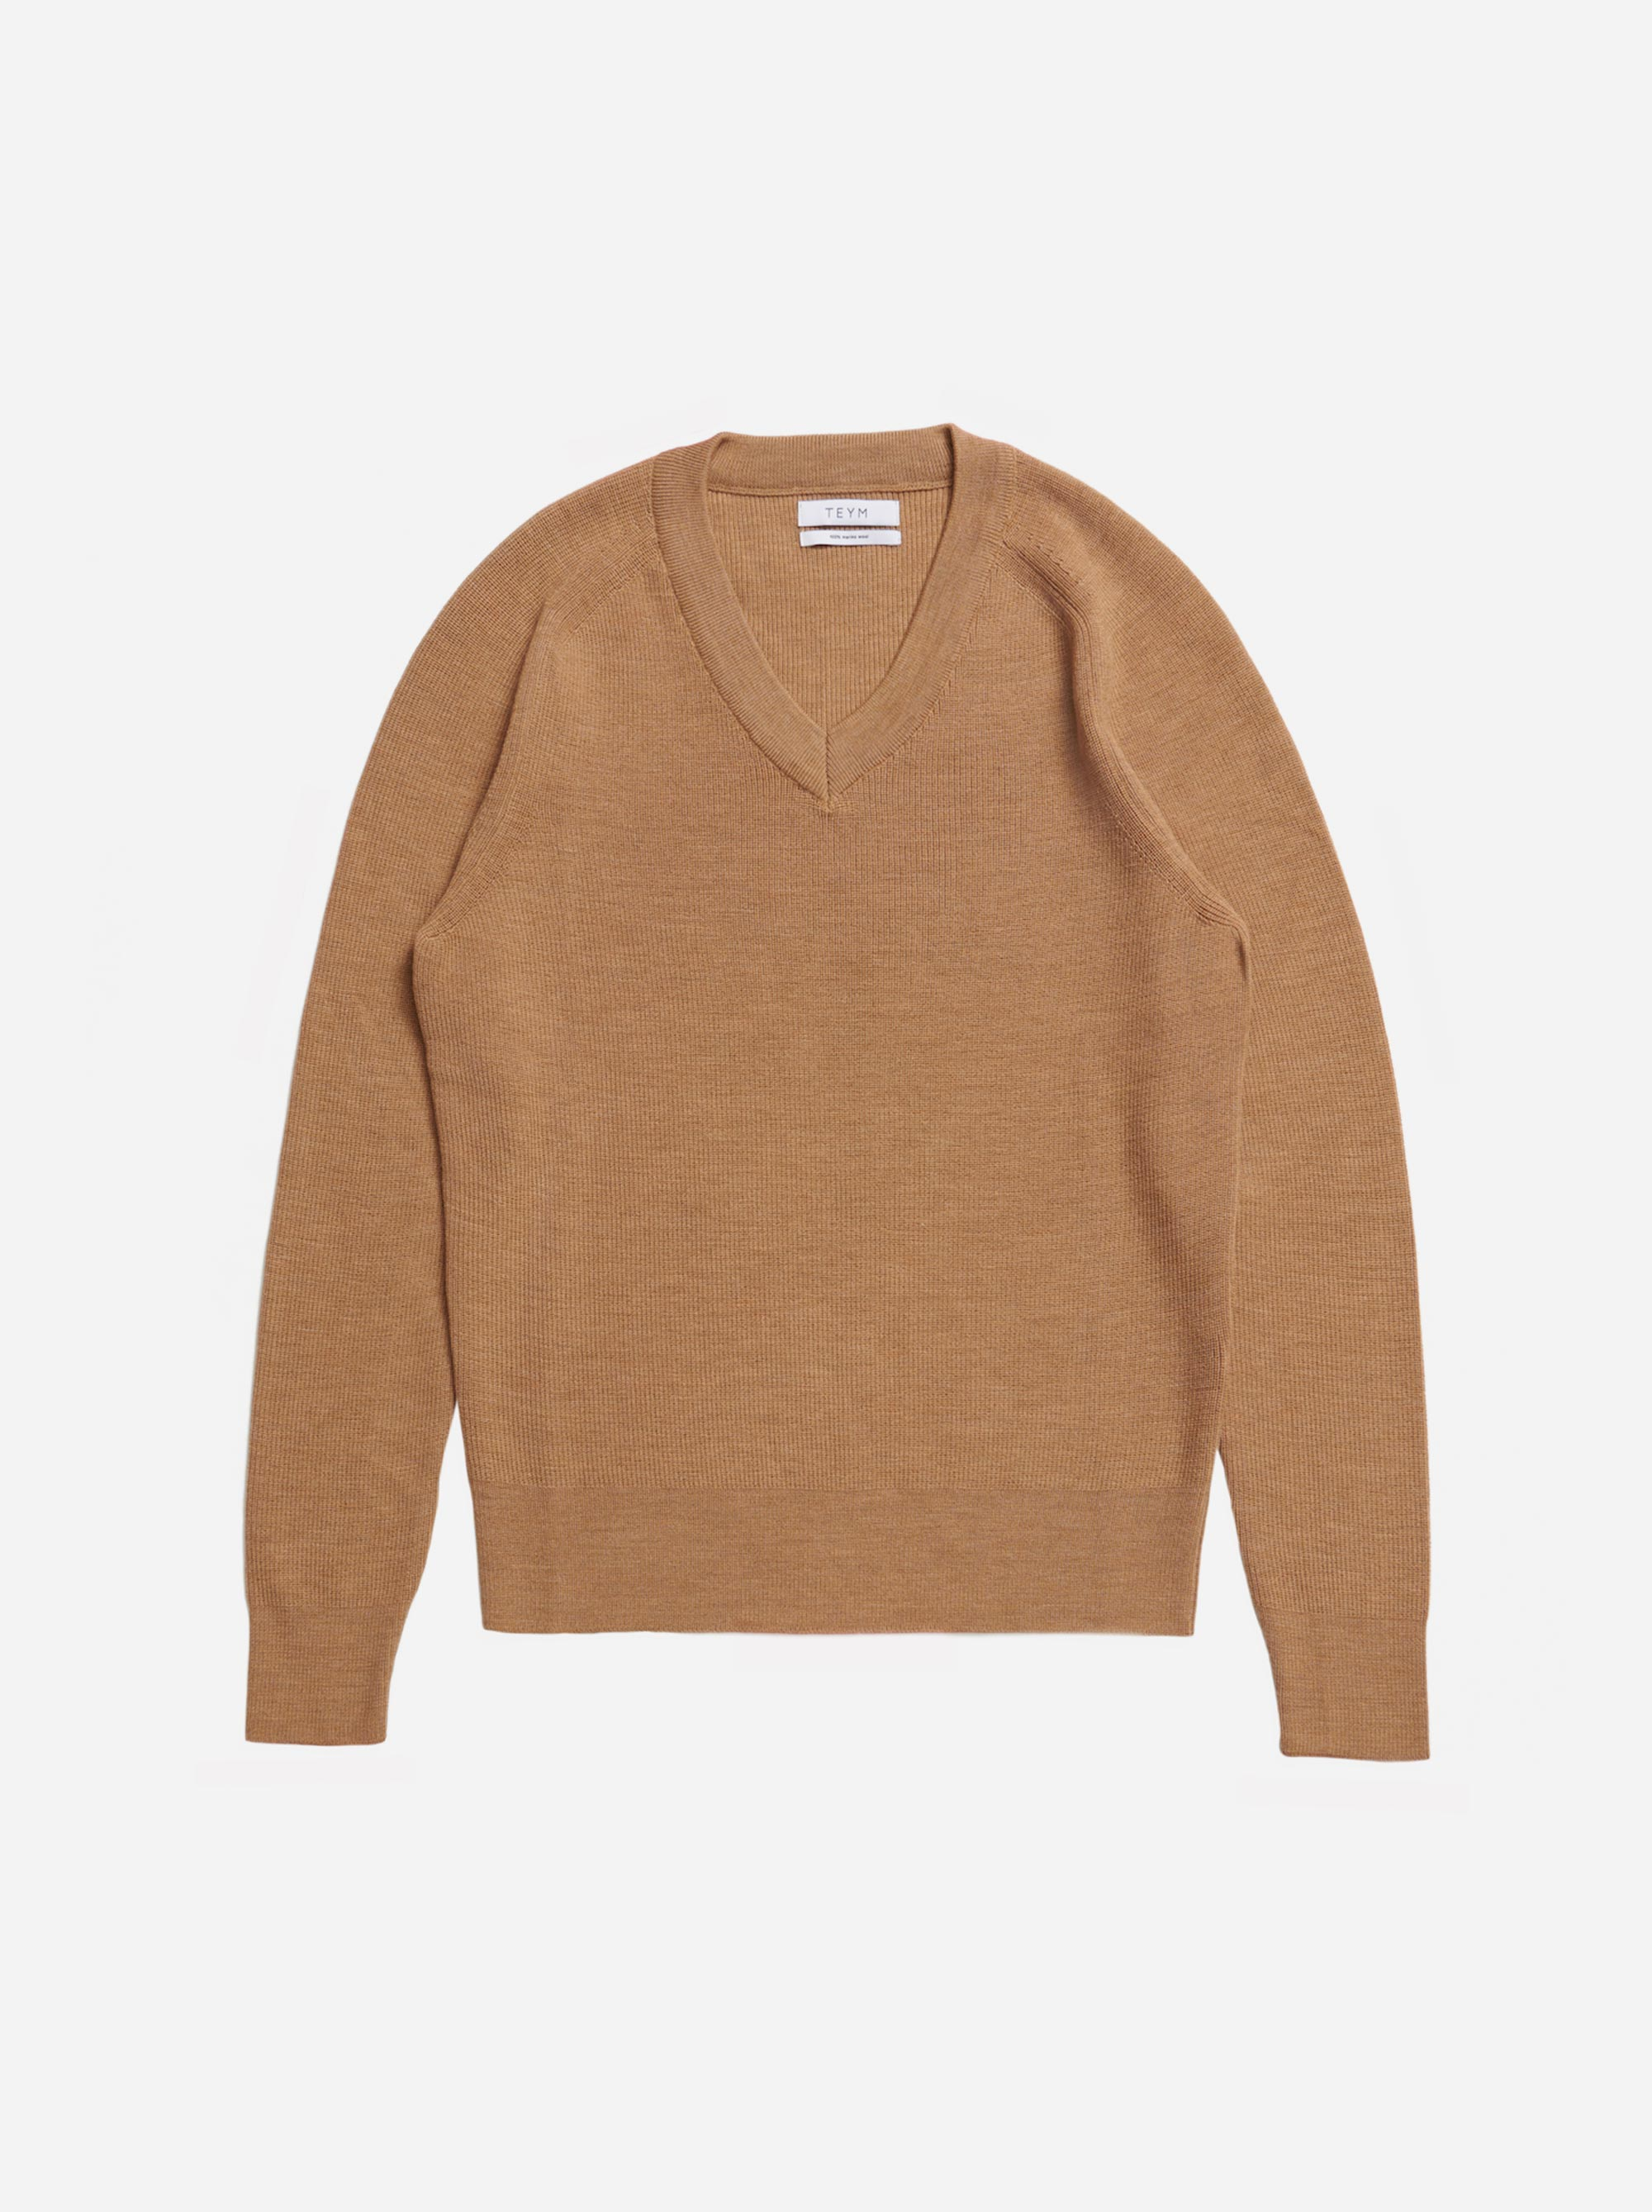 Teym - V-Neck - The Merino Sweater - Women - Camel - 4